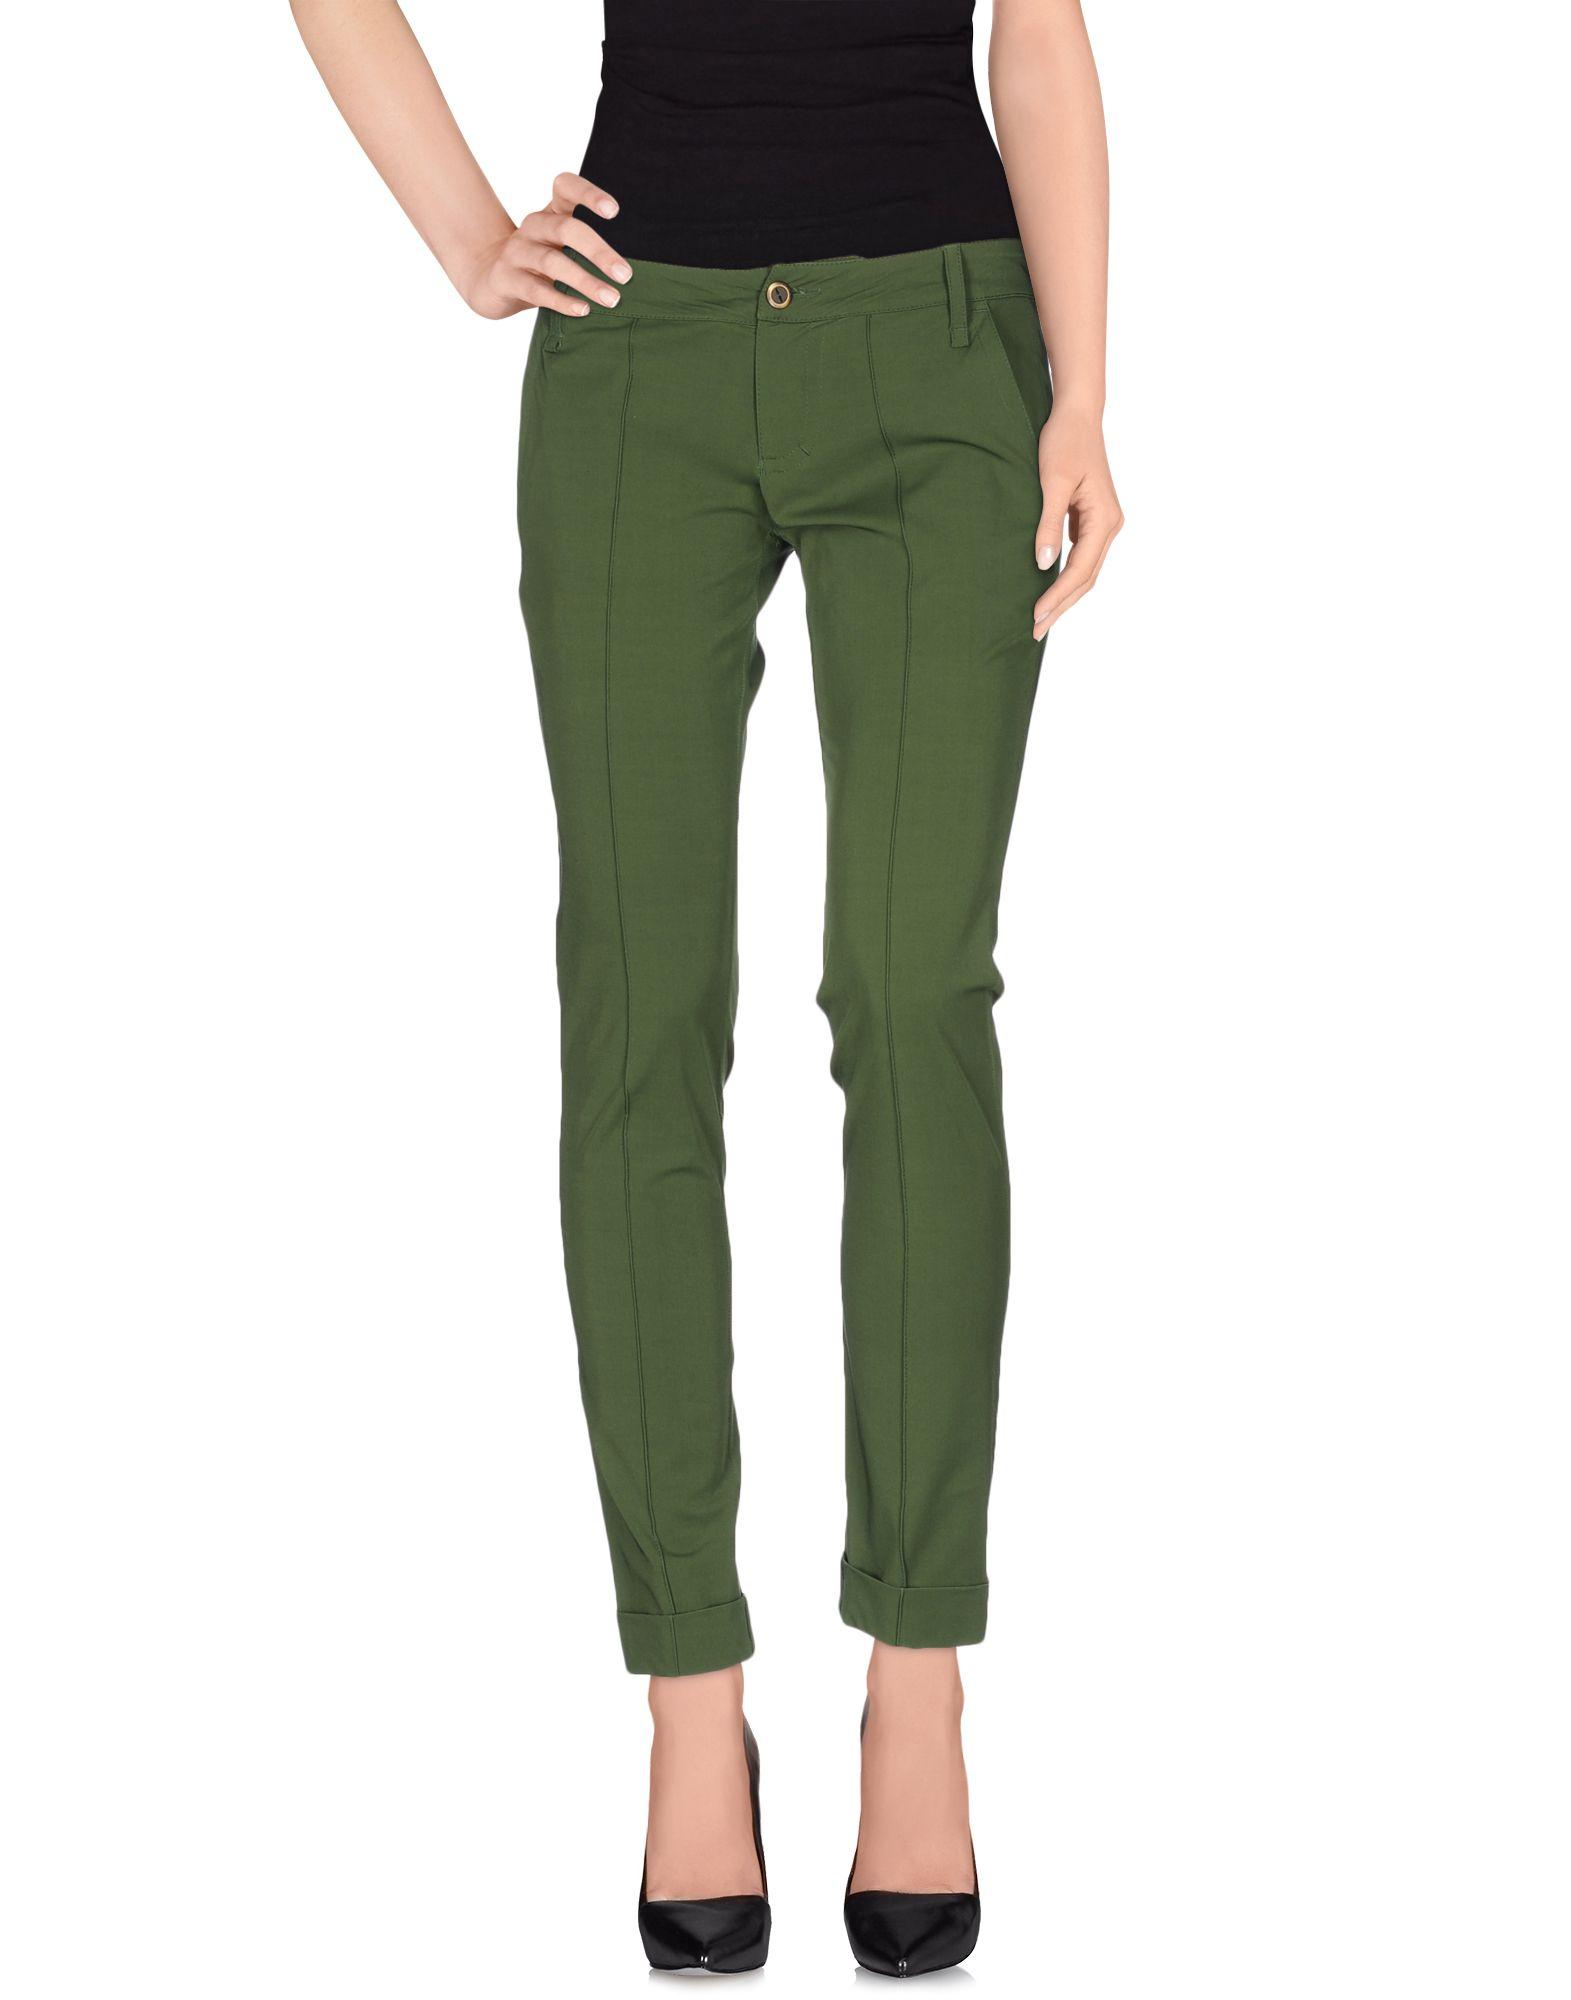 Pantalone Plein Sud Donna - Acquista online su FwFi7y